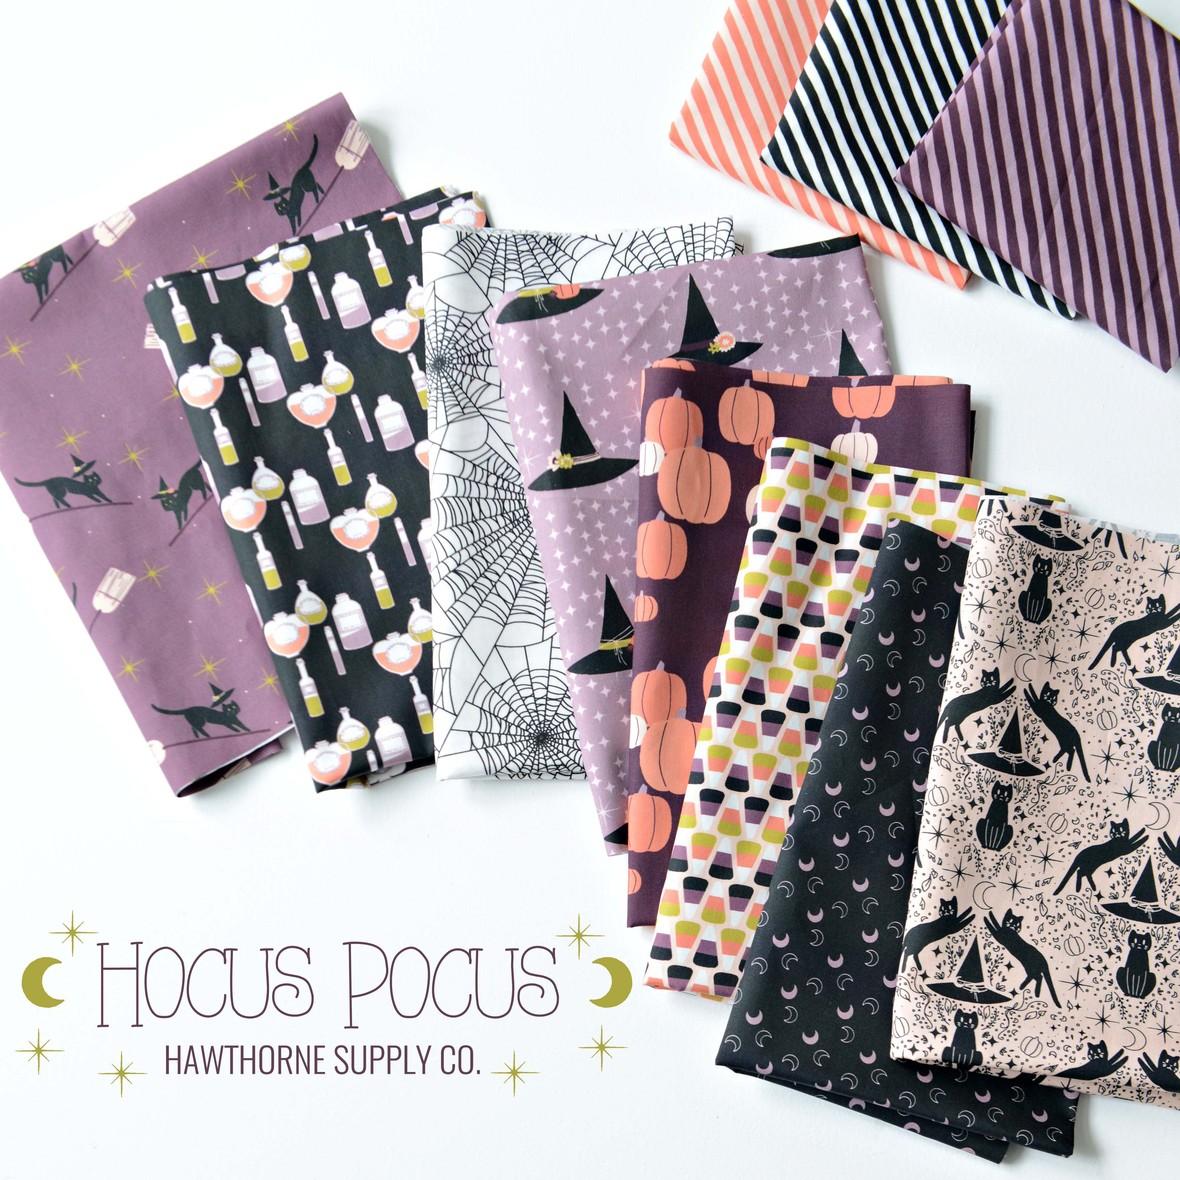 Hocus Pocus Fabric Poster Hawthorne Supply Co Halloween Fabric